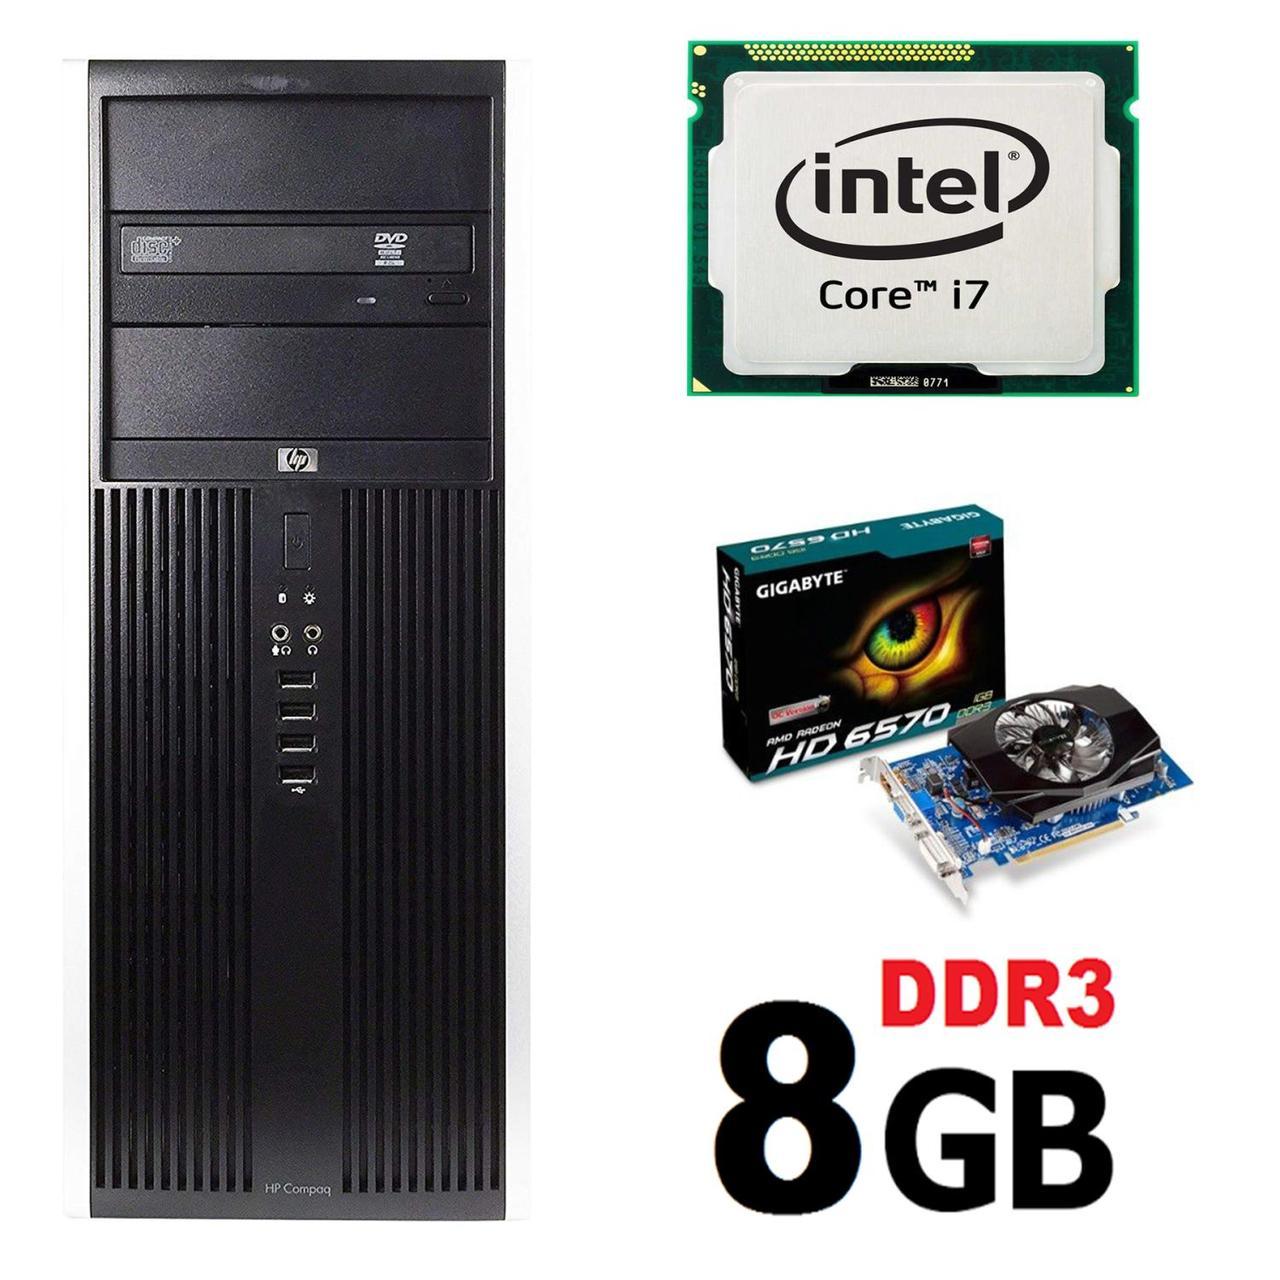 HP 8100 Tower / Intel Core i7-860 (4(8) ядра по 2.8-3.46GHz) / 8GB DDR3 / 1000GB HDD / AMD Radeon HD 6570 2GB 128-bit